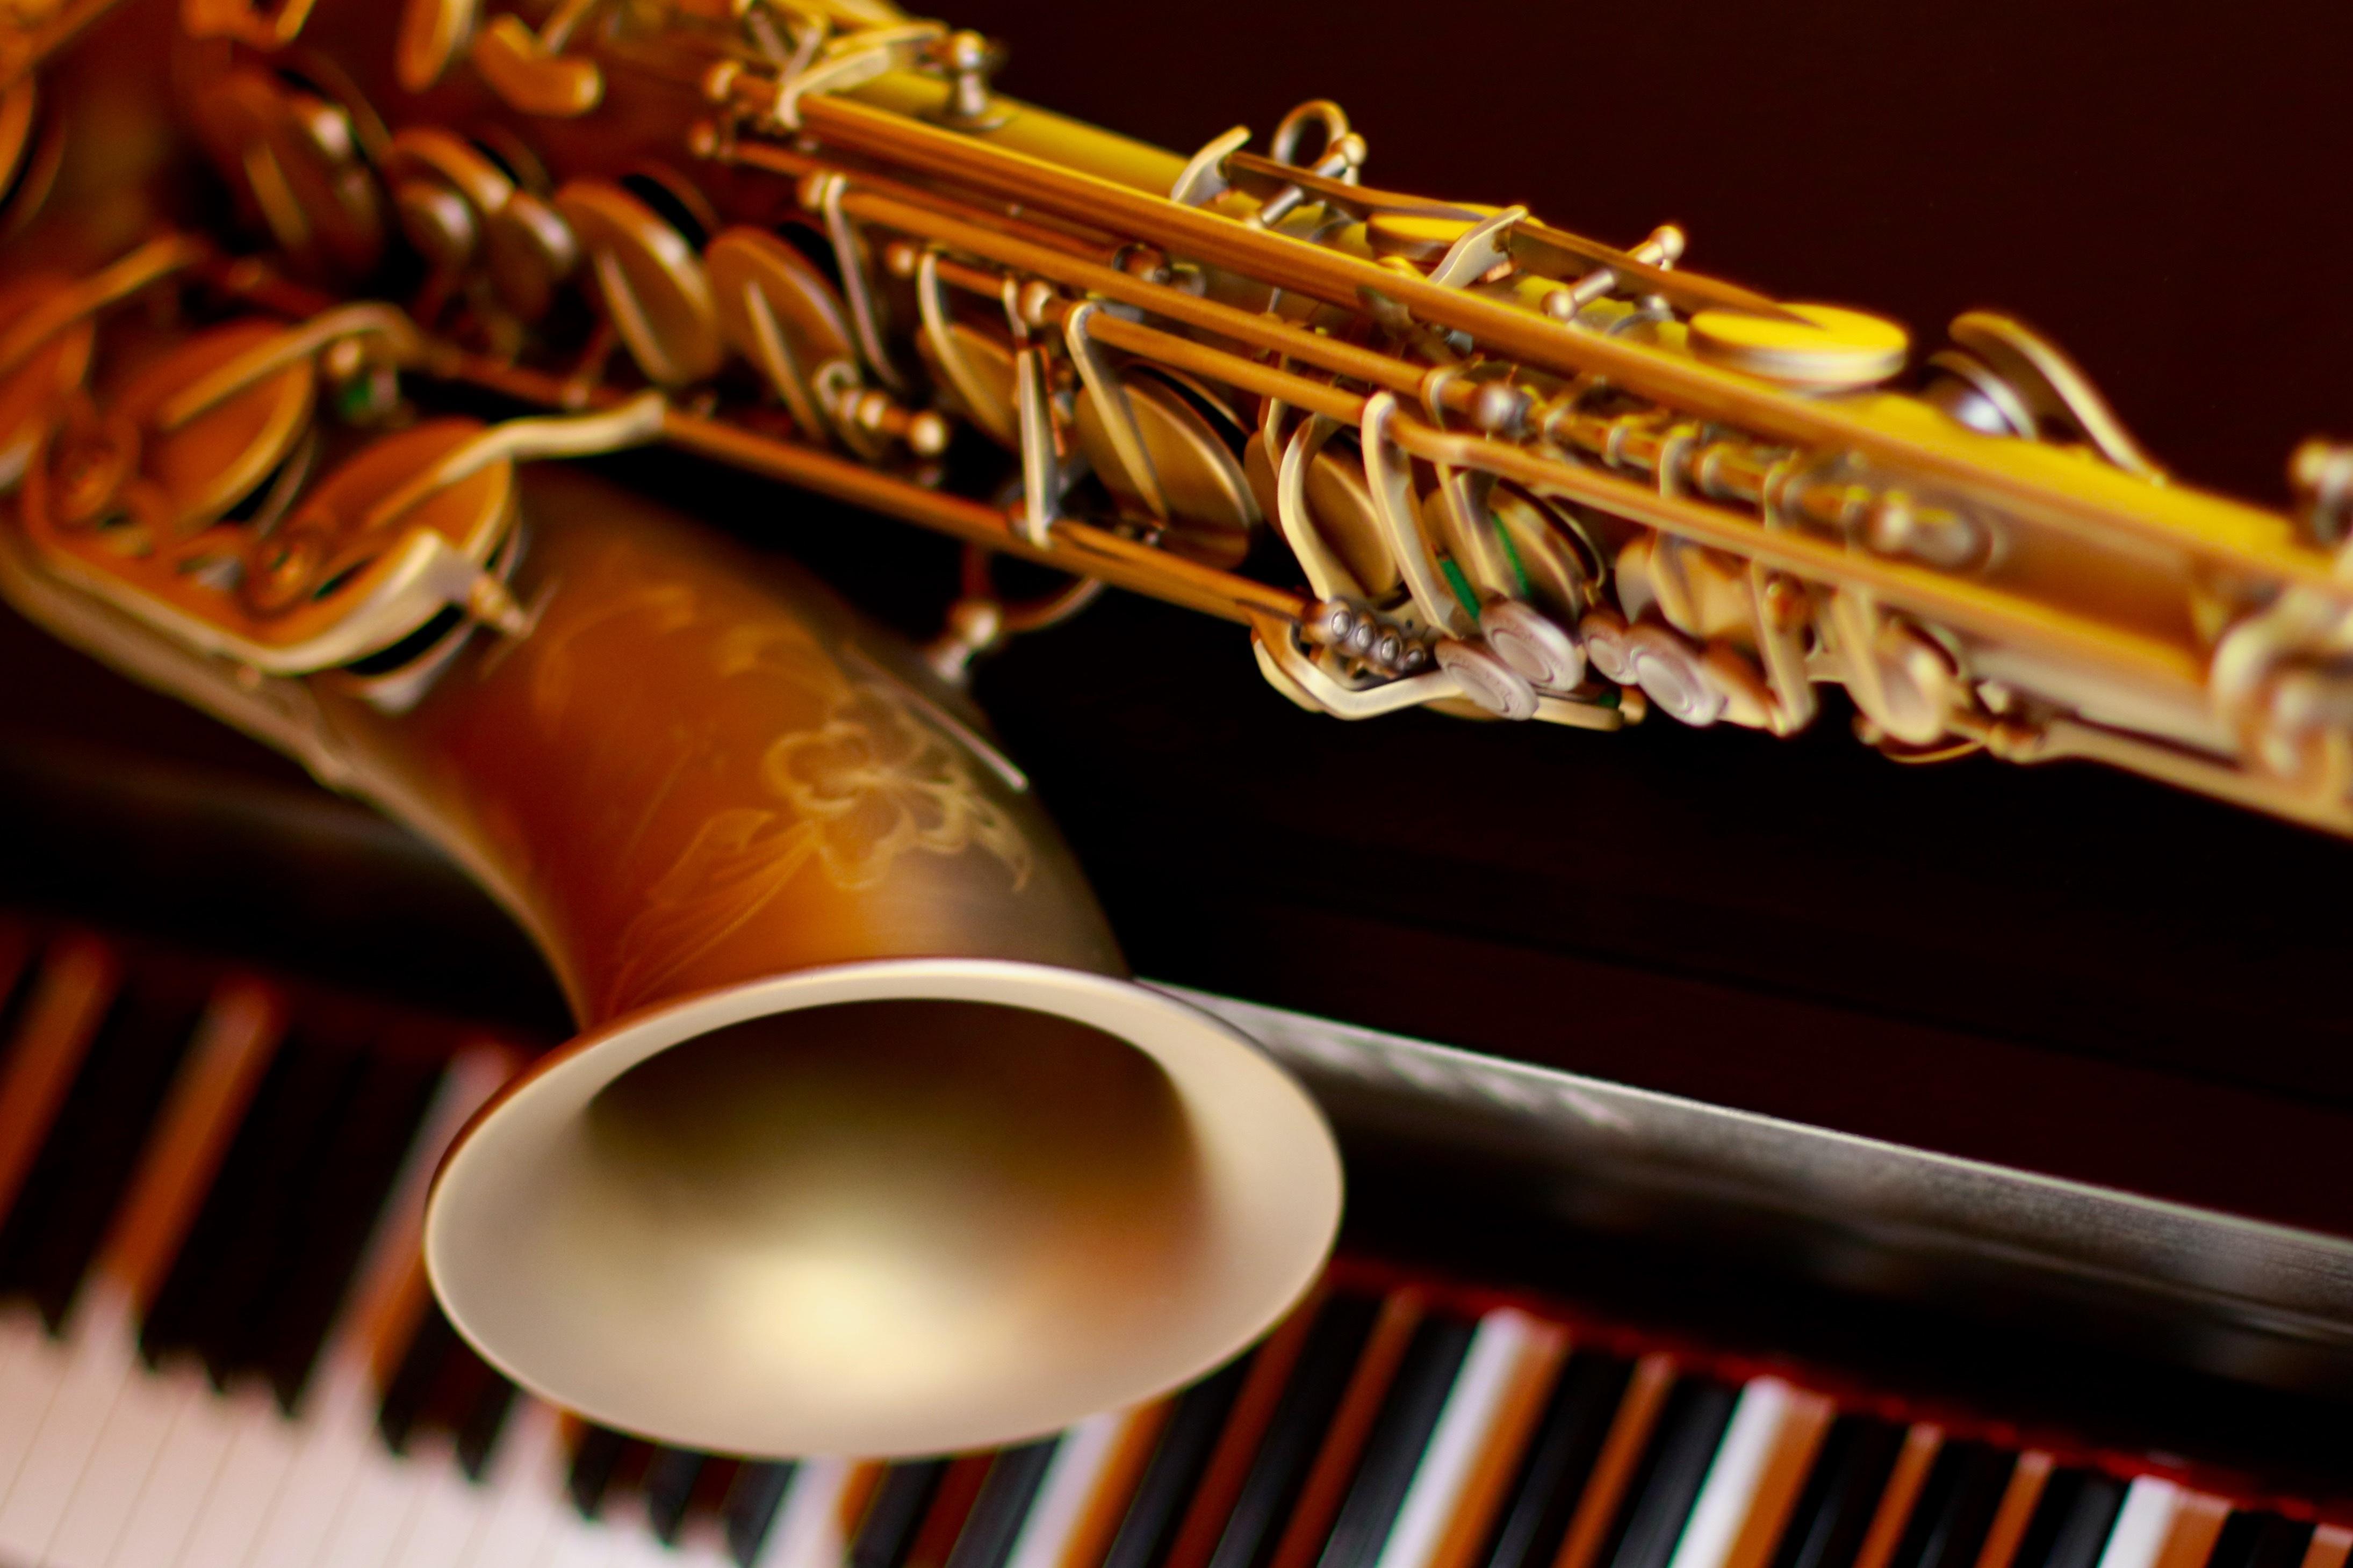 2560x1440 saxophone